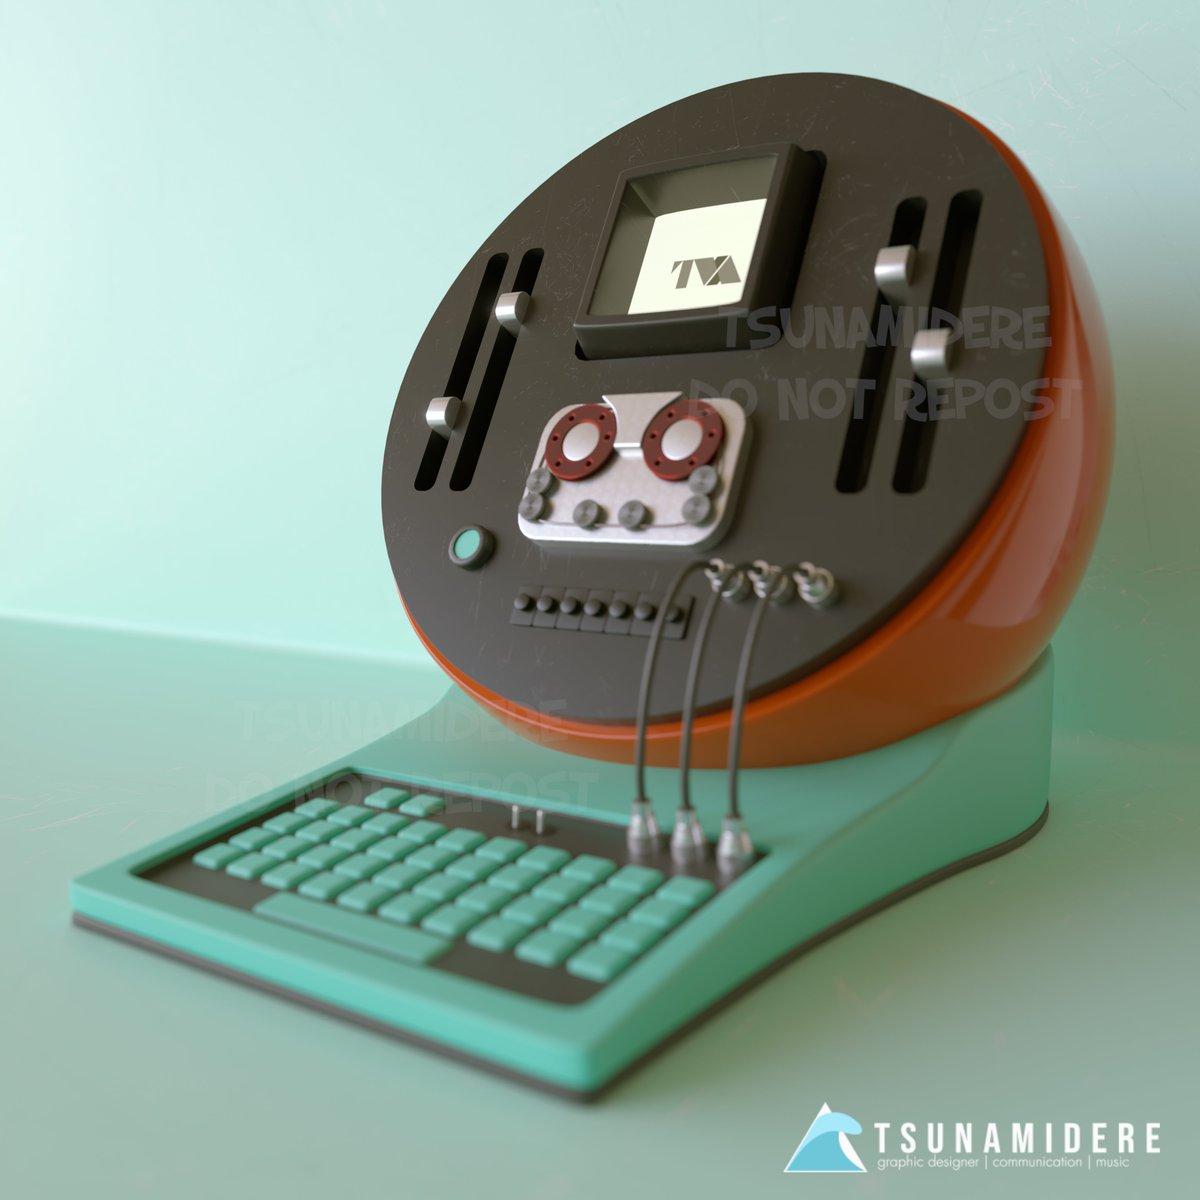 #TVA #computer from #Loki made with #cinema4D // #coronarenderer // #Marvel // #MCU // https://t.co/scPKK3pMf3